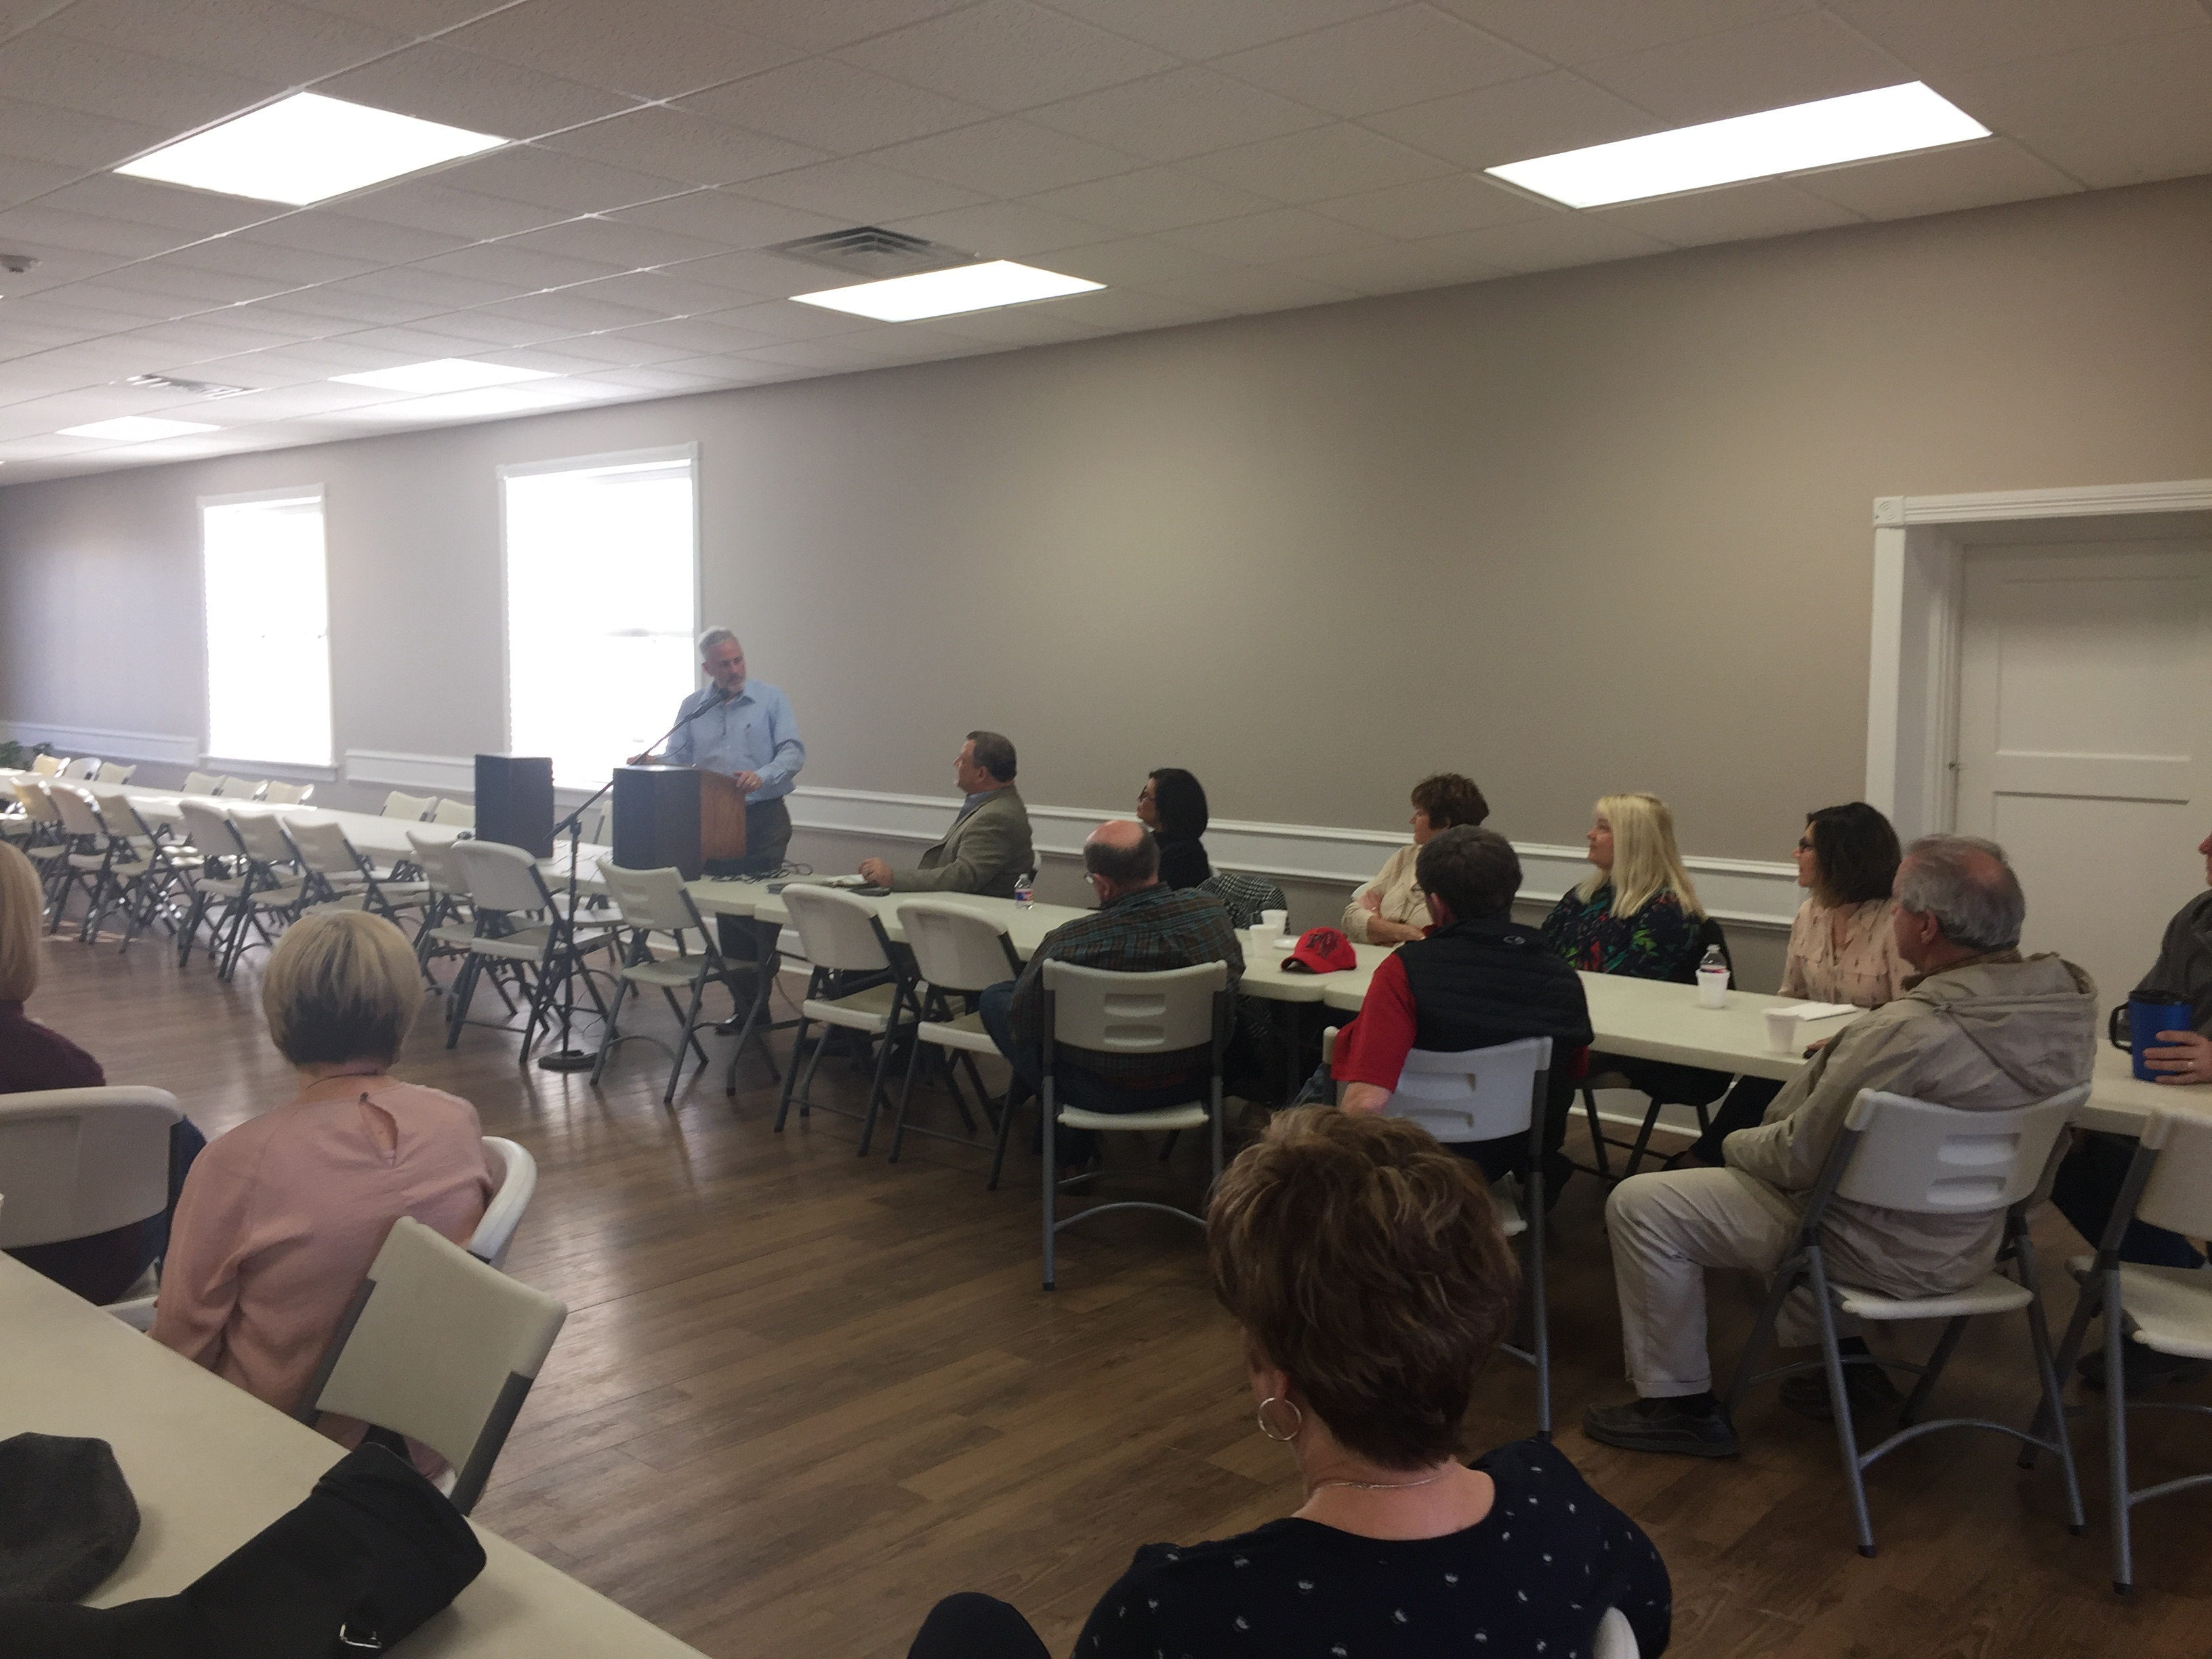 Steve Warren is presenting the program to Slaton Area Endowment Community Development Meeting